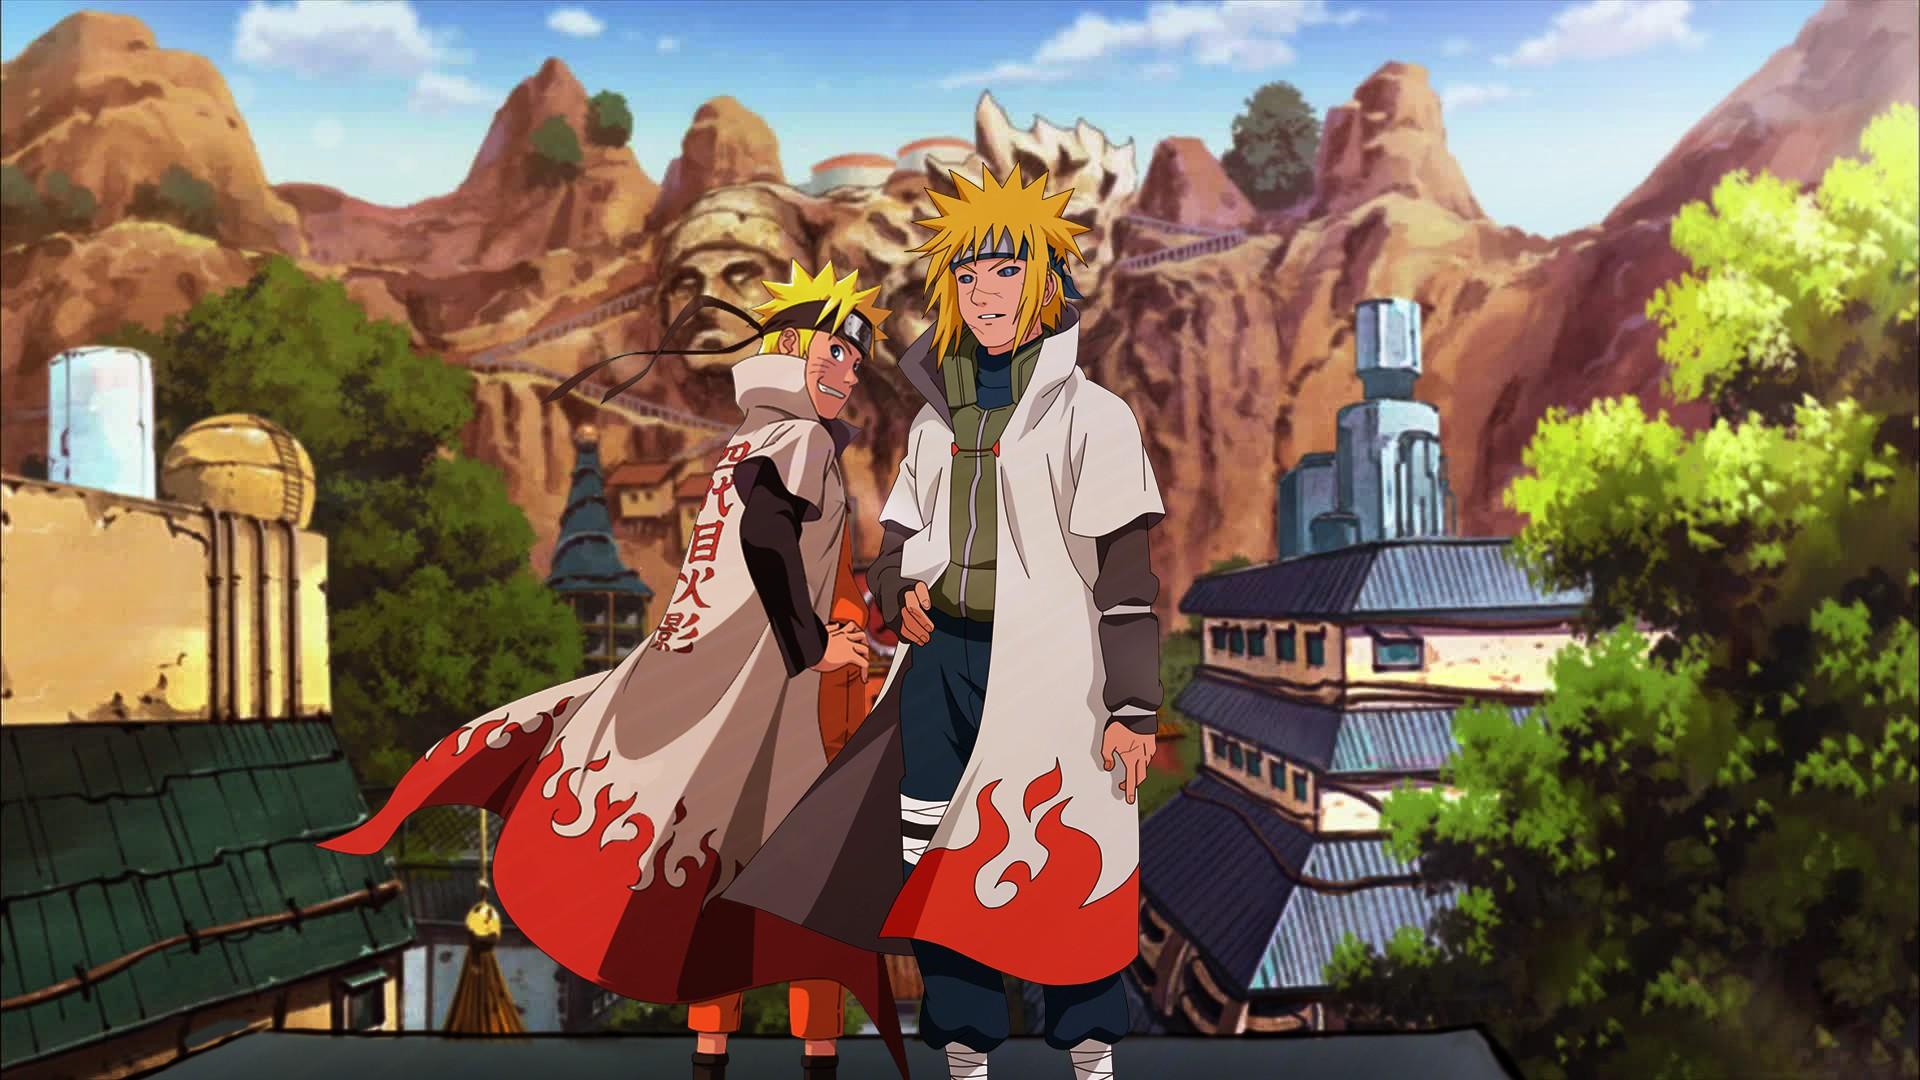 Wallpaper Anime Naruto Shippuuden Uzumaki Naruto Namikaze